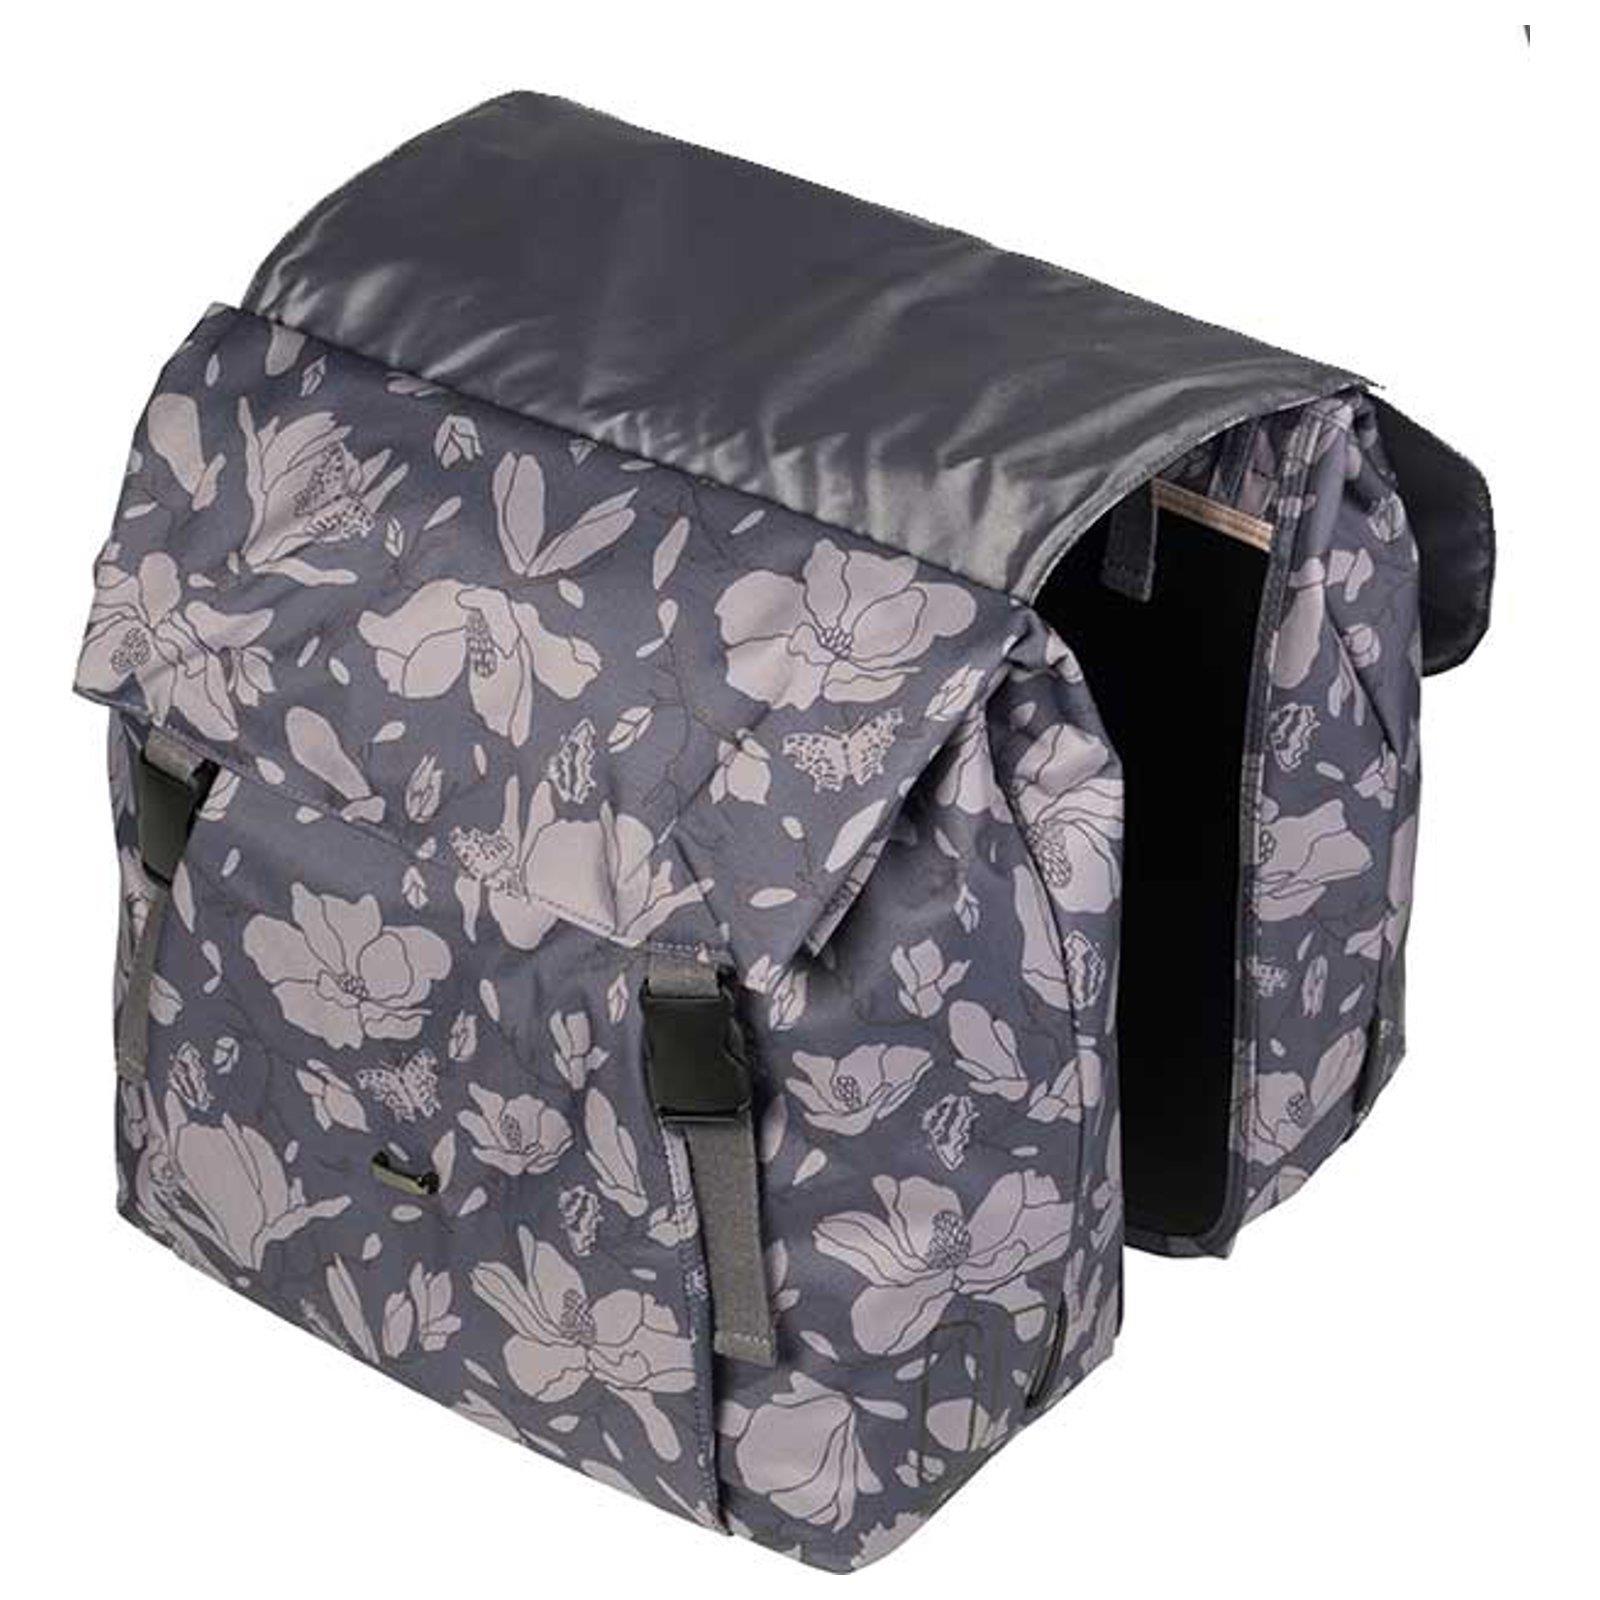 basil magnolia doppel packtasche 35 l fahrrad damen gep cktr ger tasche blumen ebay. Black Bedroom Furniture Sets. Home Design Ideas